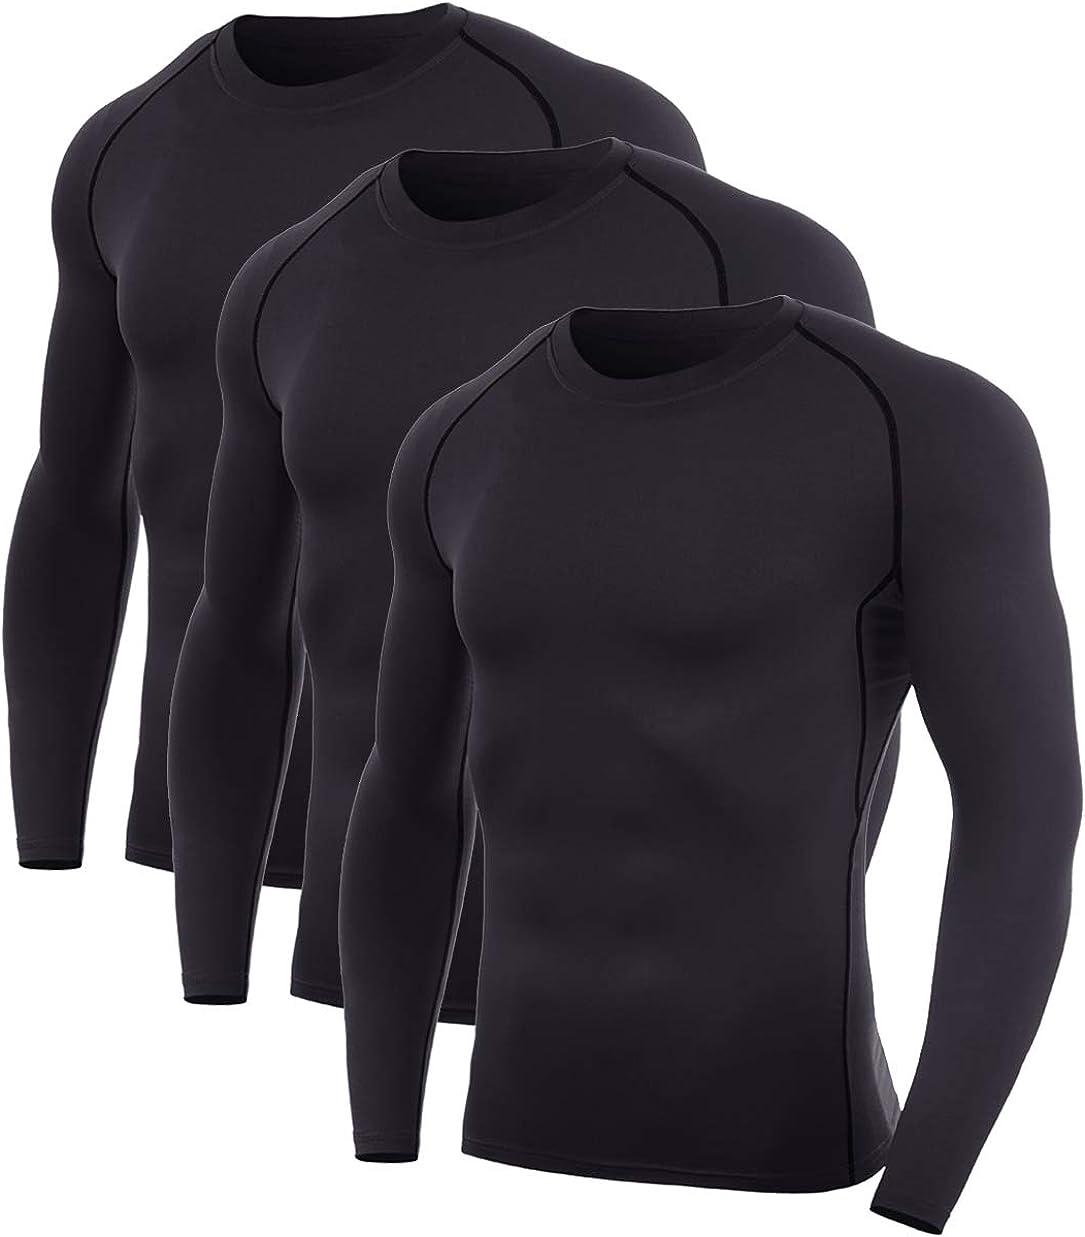 SILKWORLD Men's 5% OFF Long-Sleeve Compression Running Shirt Base-Layer Max 54% OFF